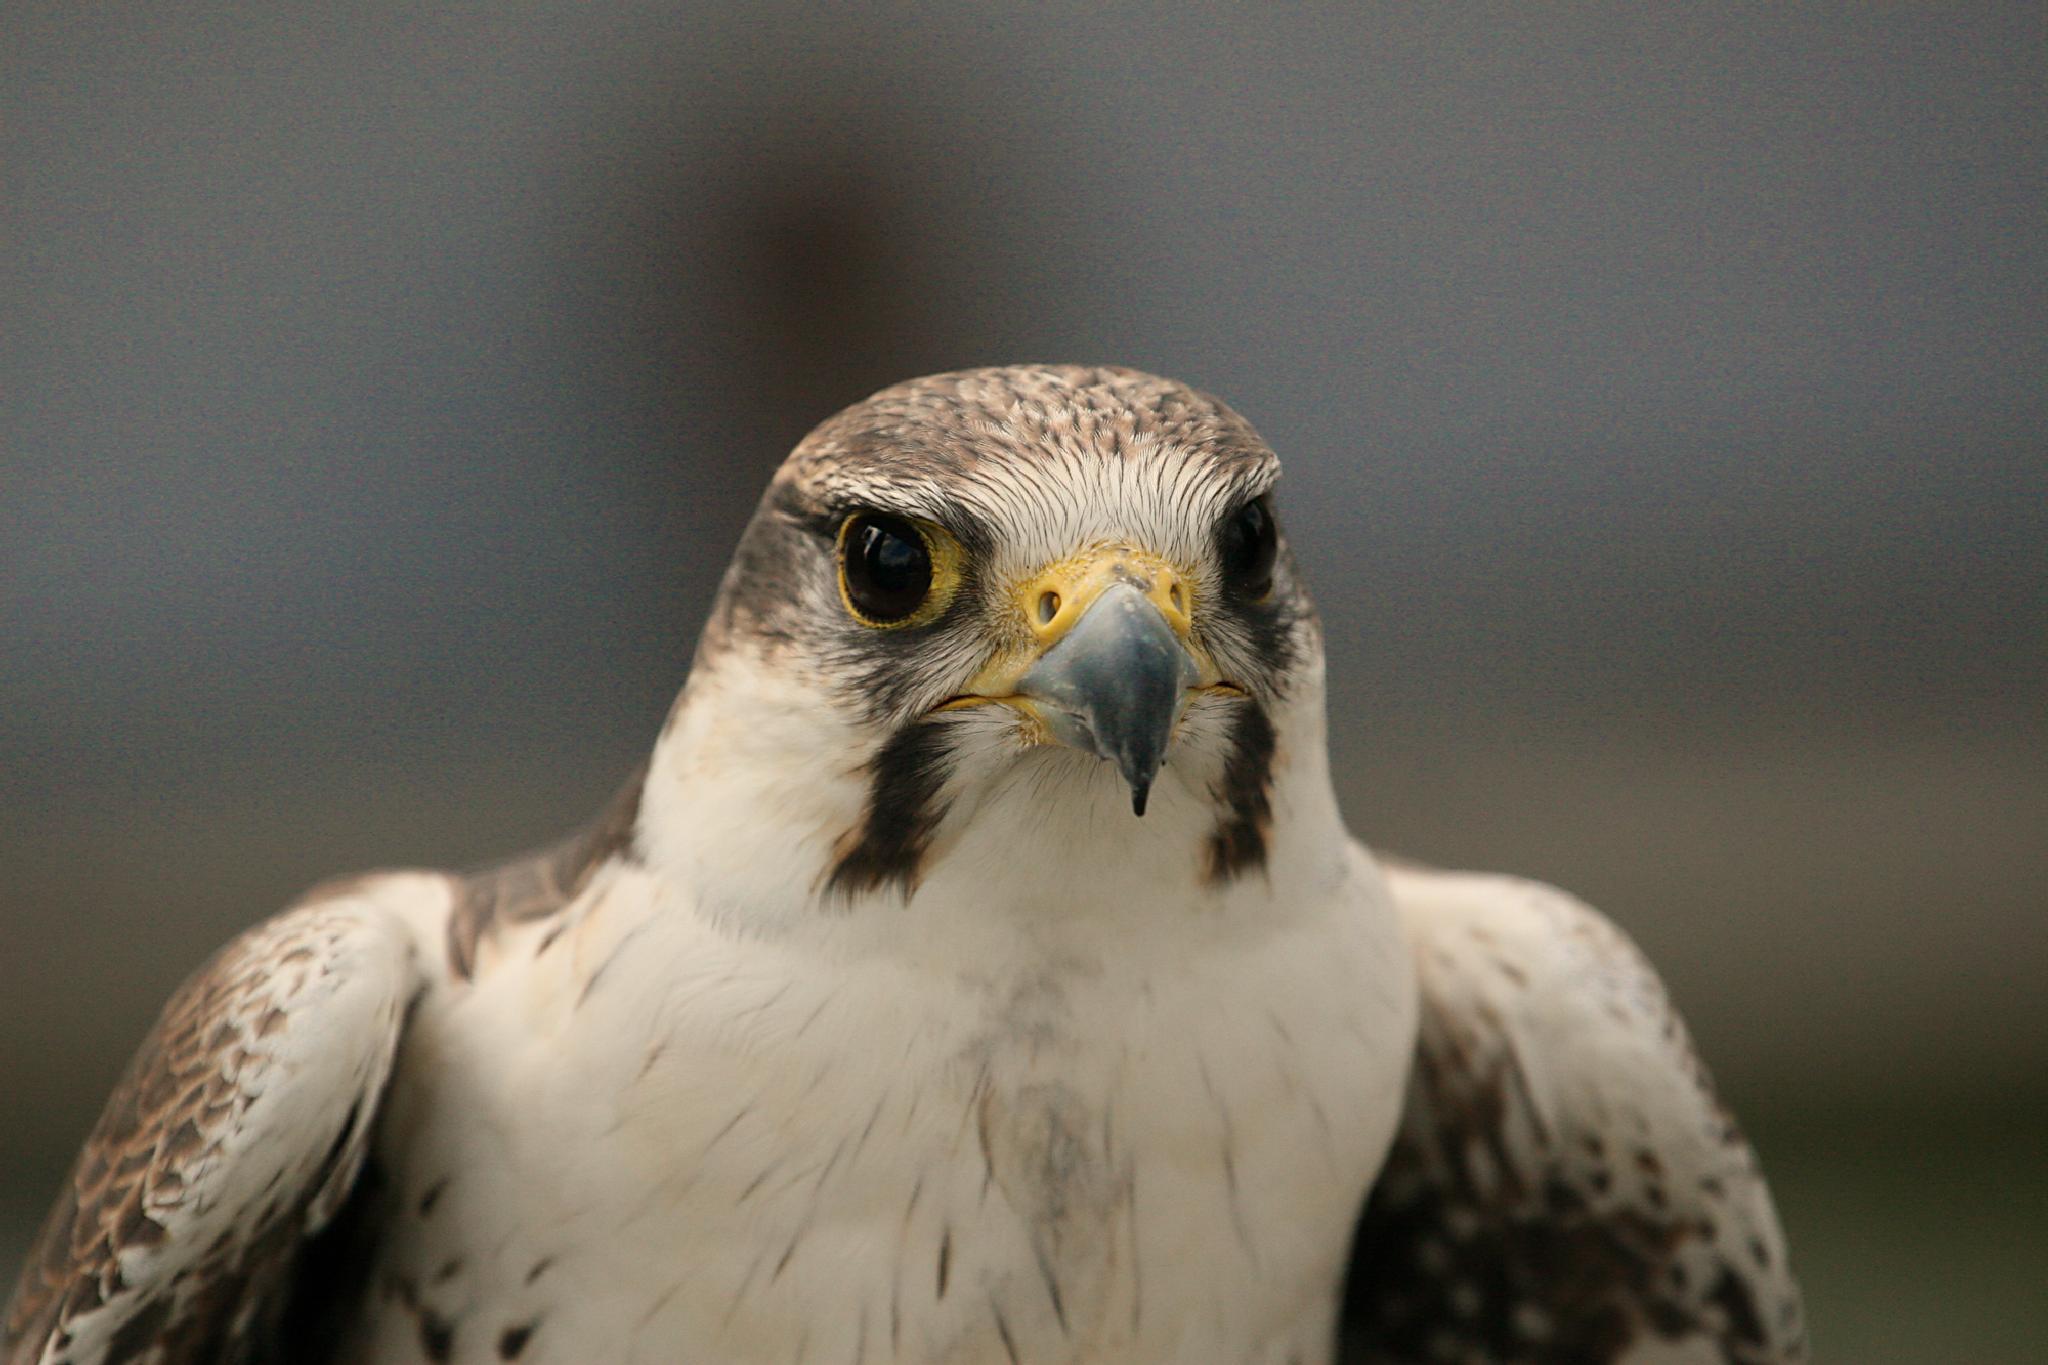 Falcon ready for Take Off by Kaje